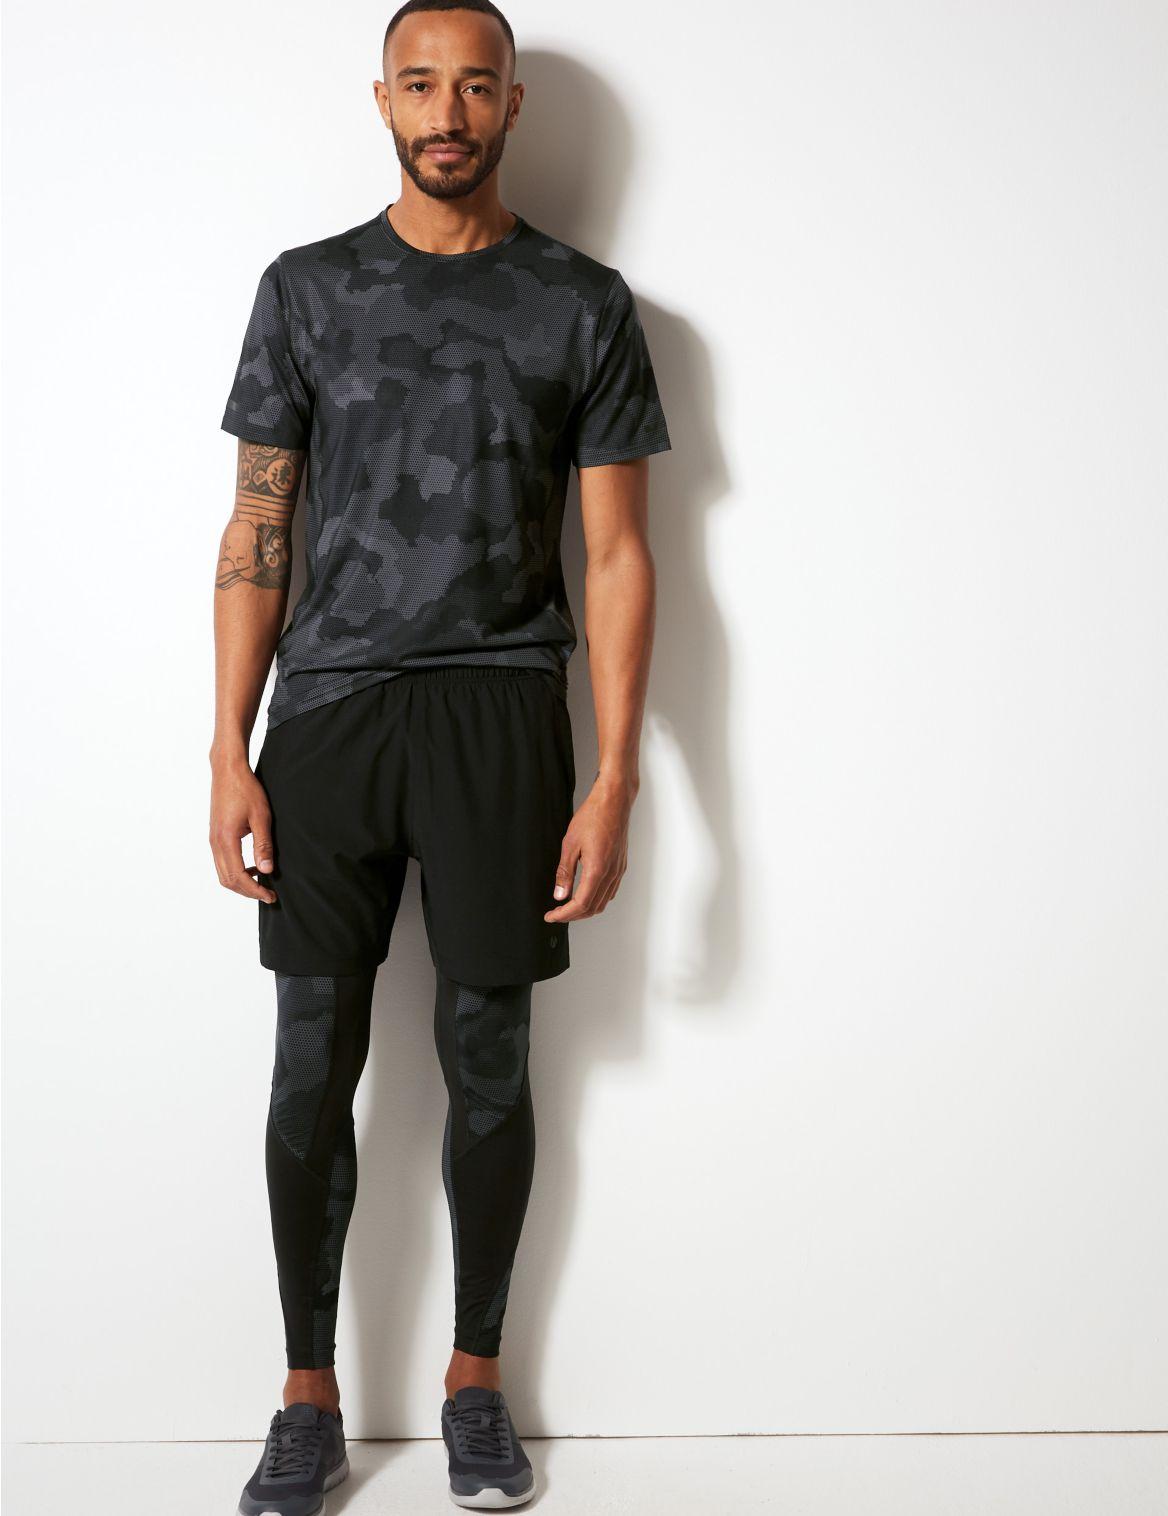 Leggings de sport. StyleForme du produit:Leggings;Coupe skinny;Tissu extensible